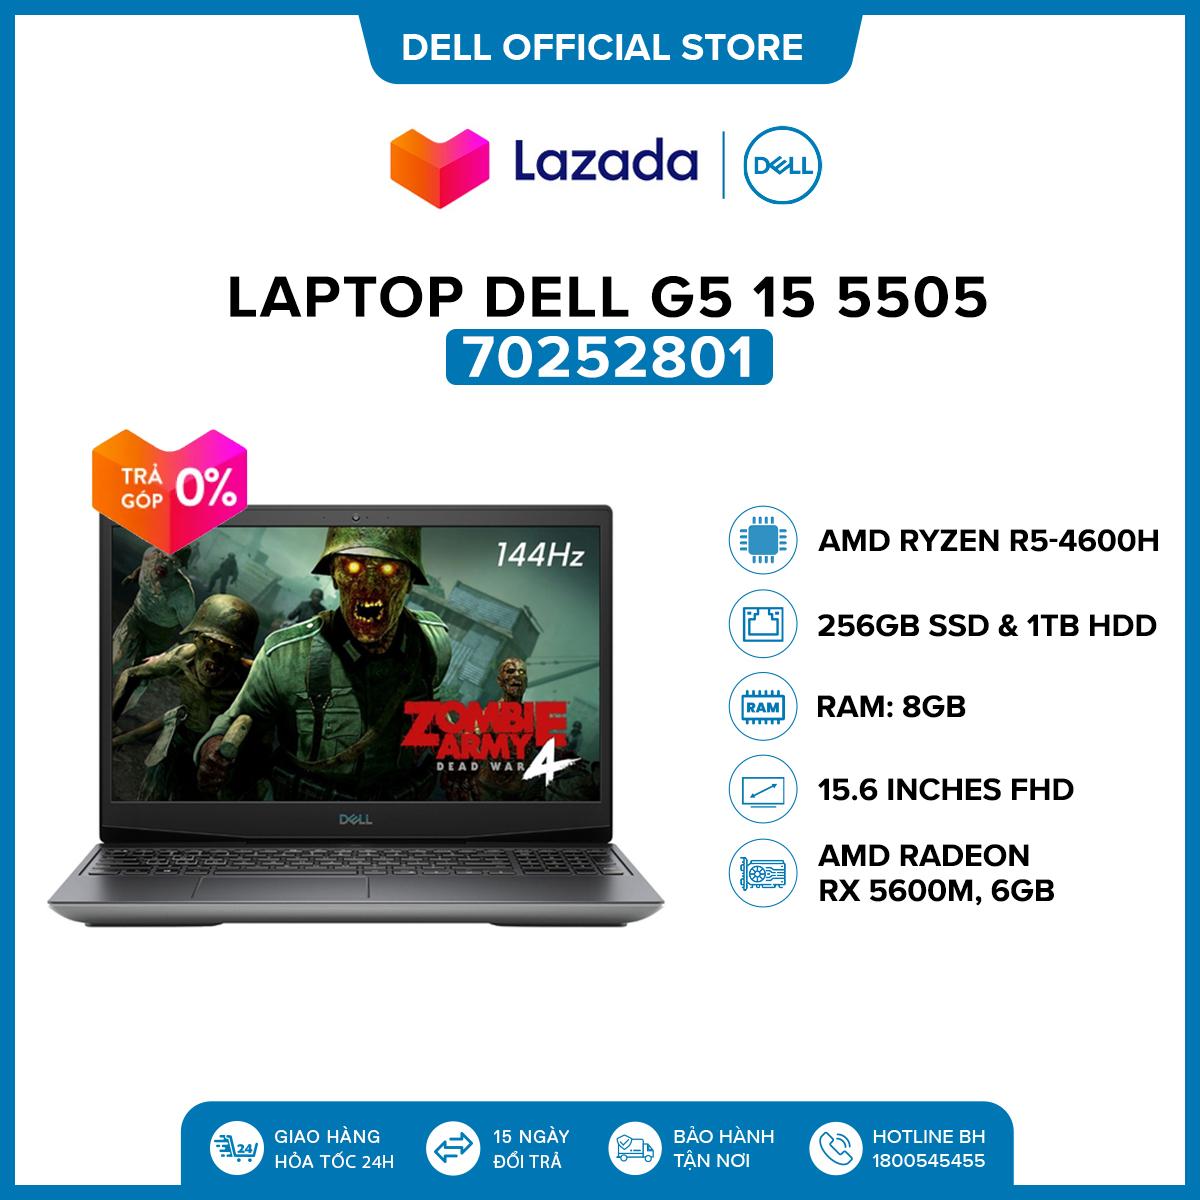 [VOUCHER 500K] Laptop Dell G5 15 5505 15.6 inches FHD (AMD Ryzen R5-4600H / 8GB / 512GB SSD / AMD...